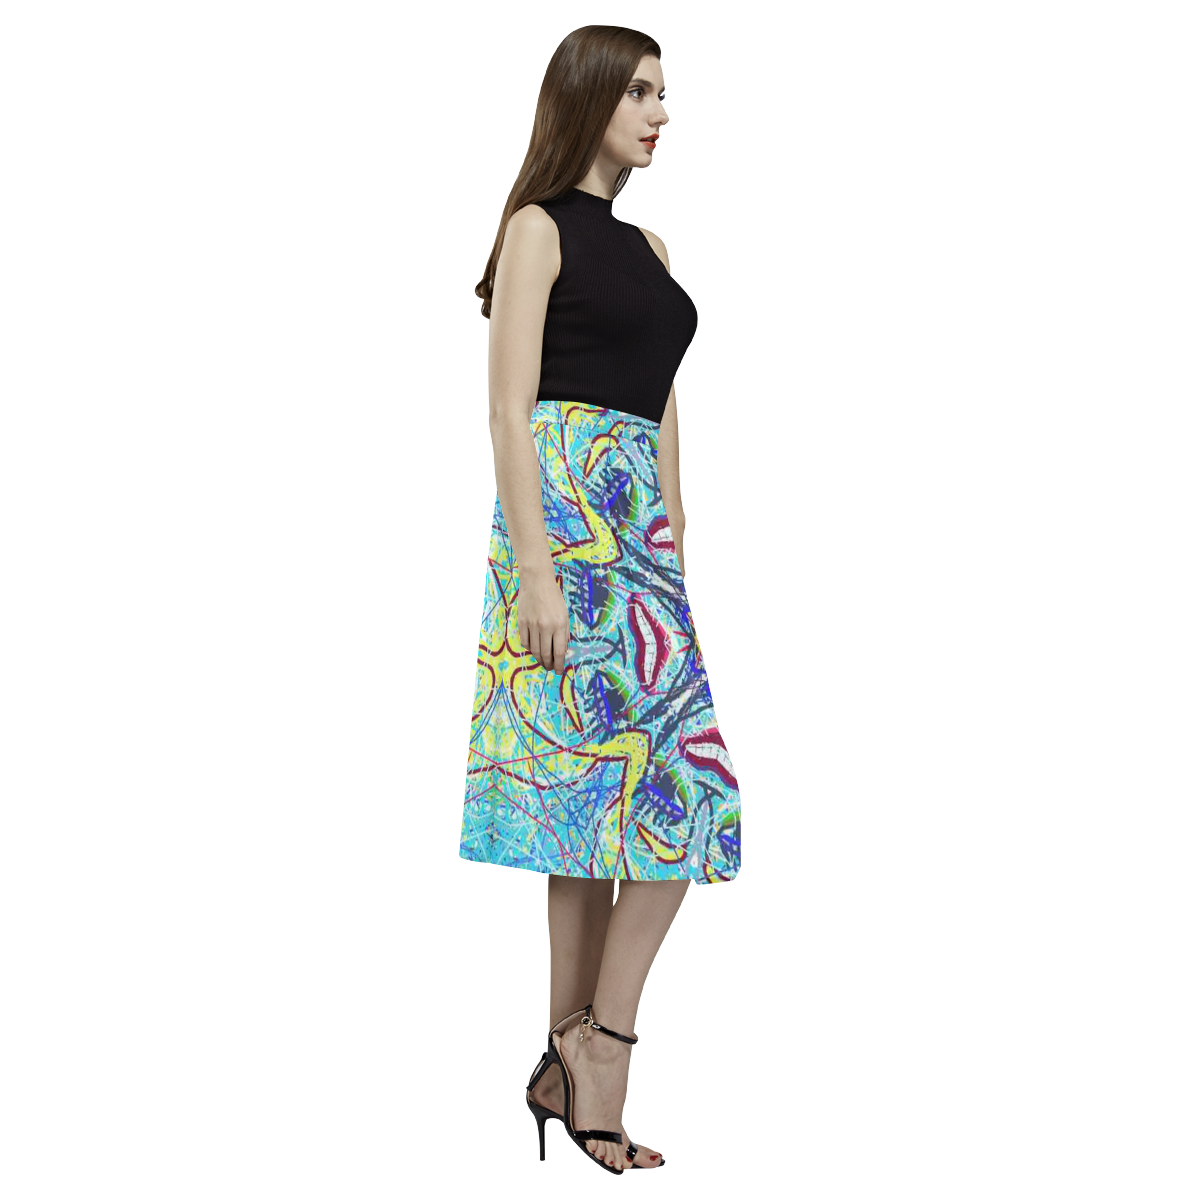 Thleudron Women's Coredelia Aoede Crepe Skirt (Model D16)